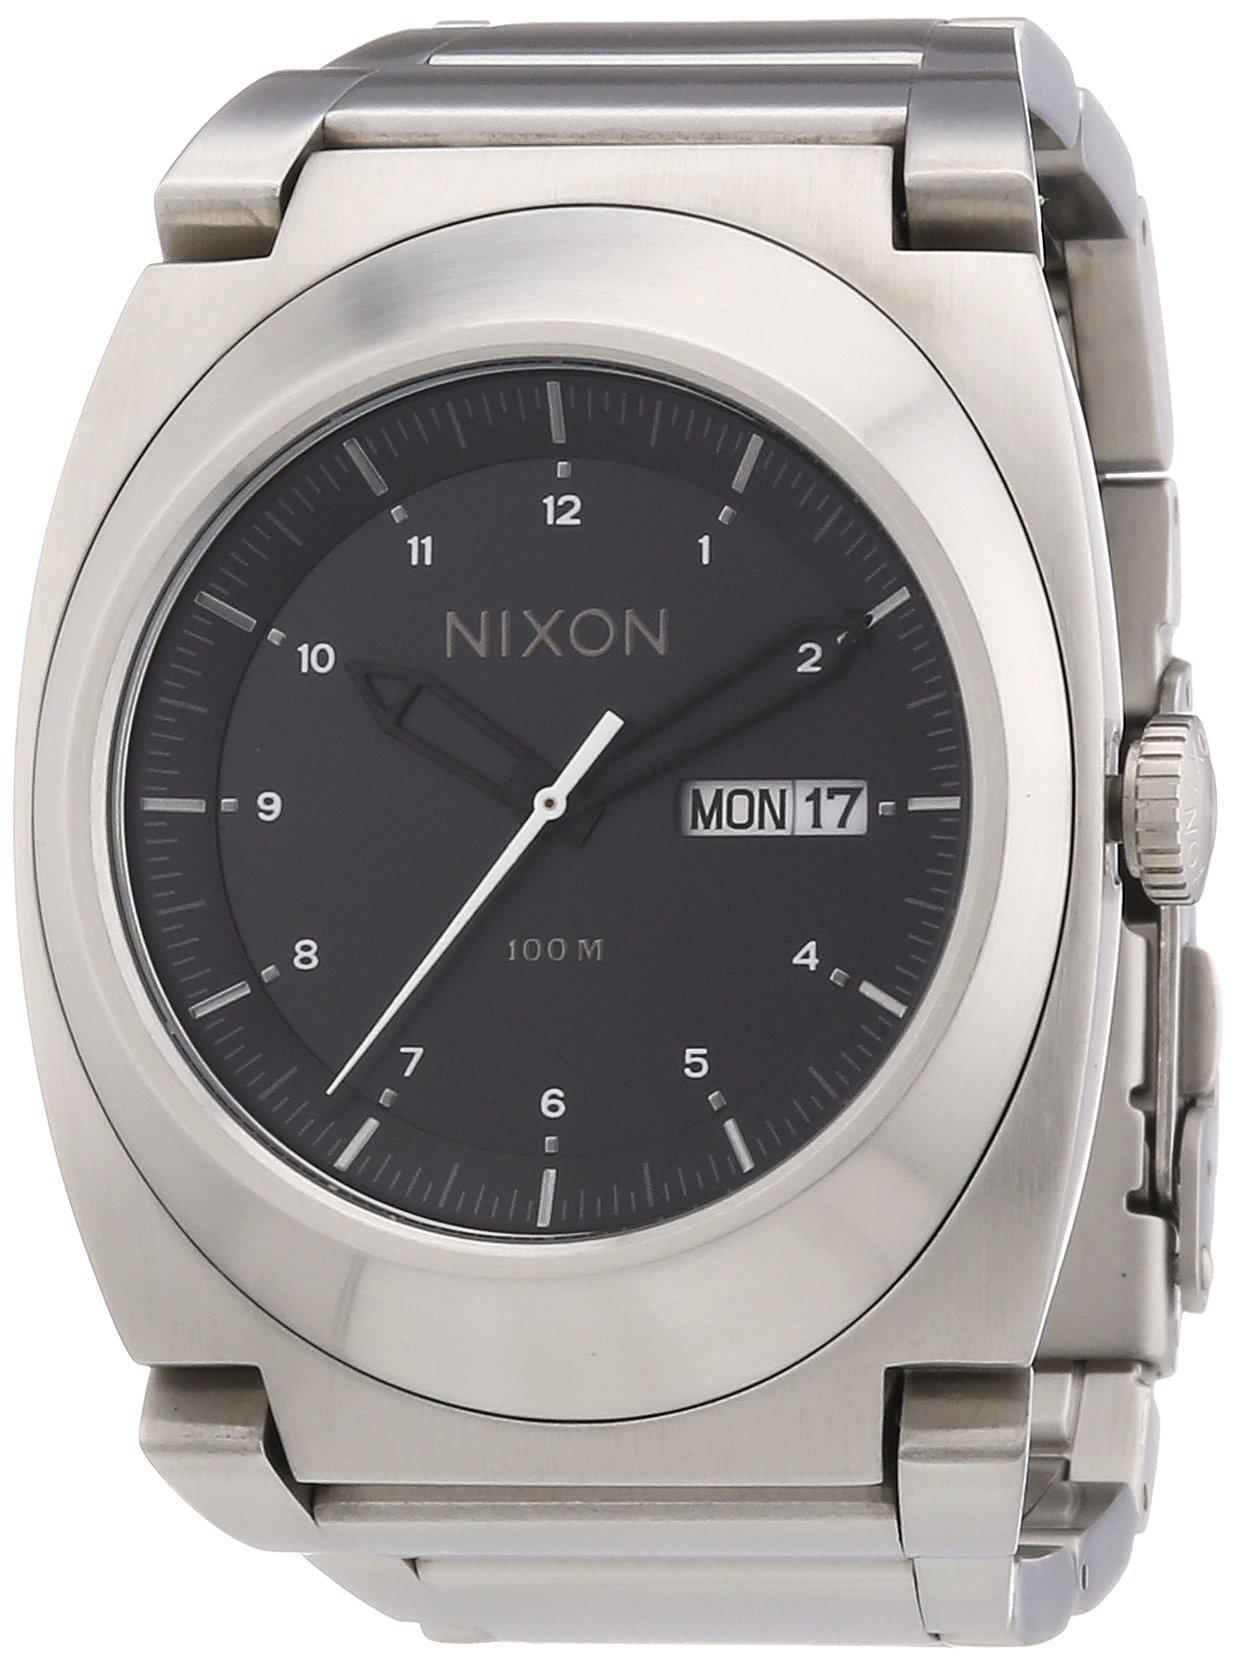 NIXON Men's Quartz Stainless Steel Casual Watch(Model: A358-000)